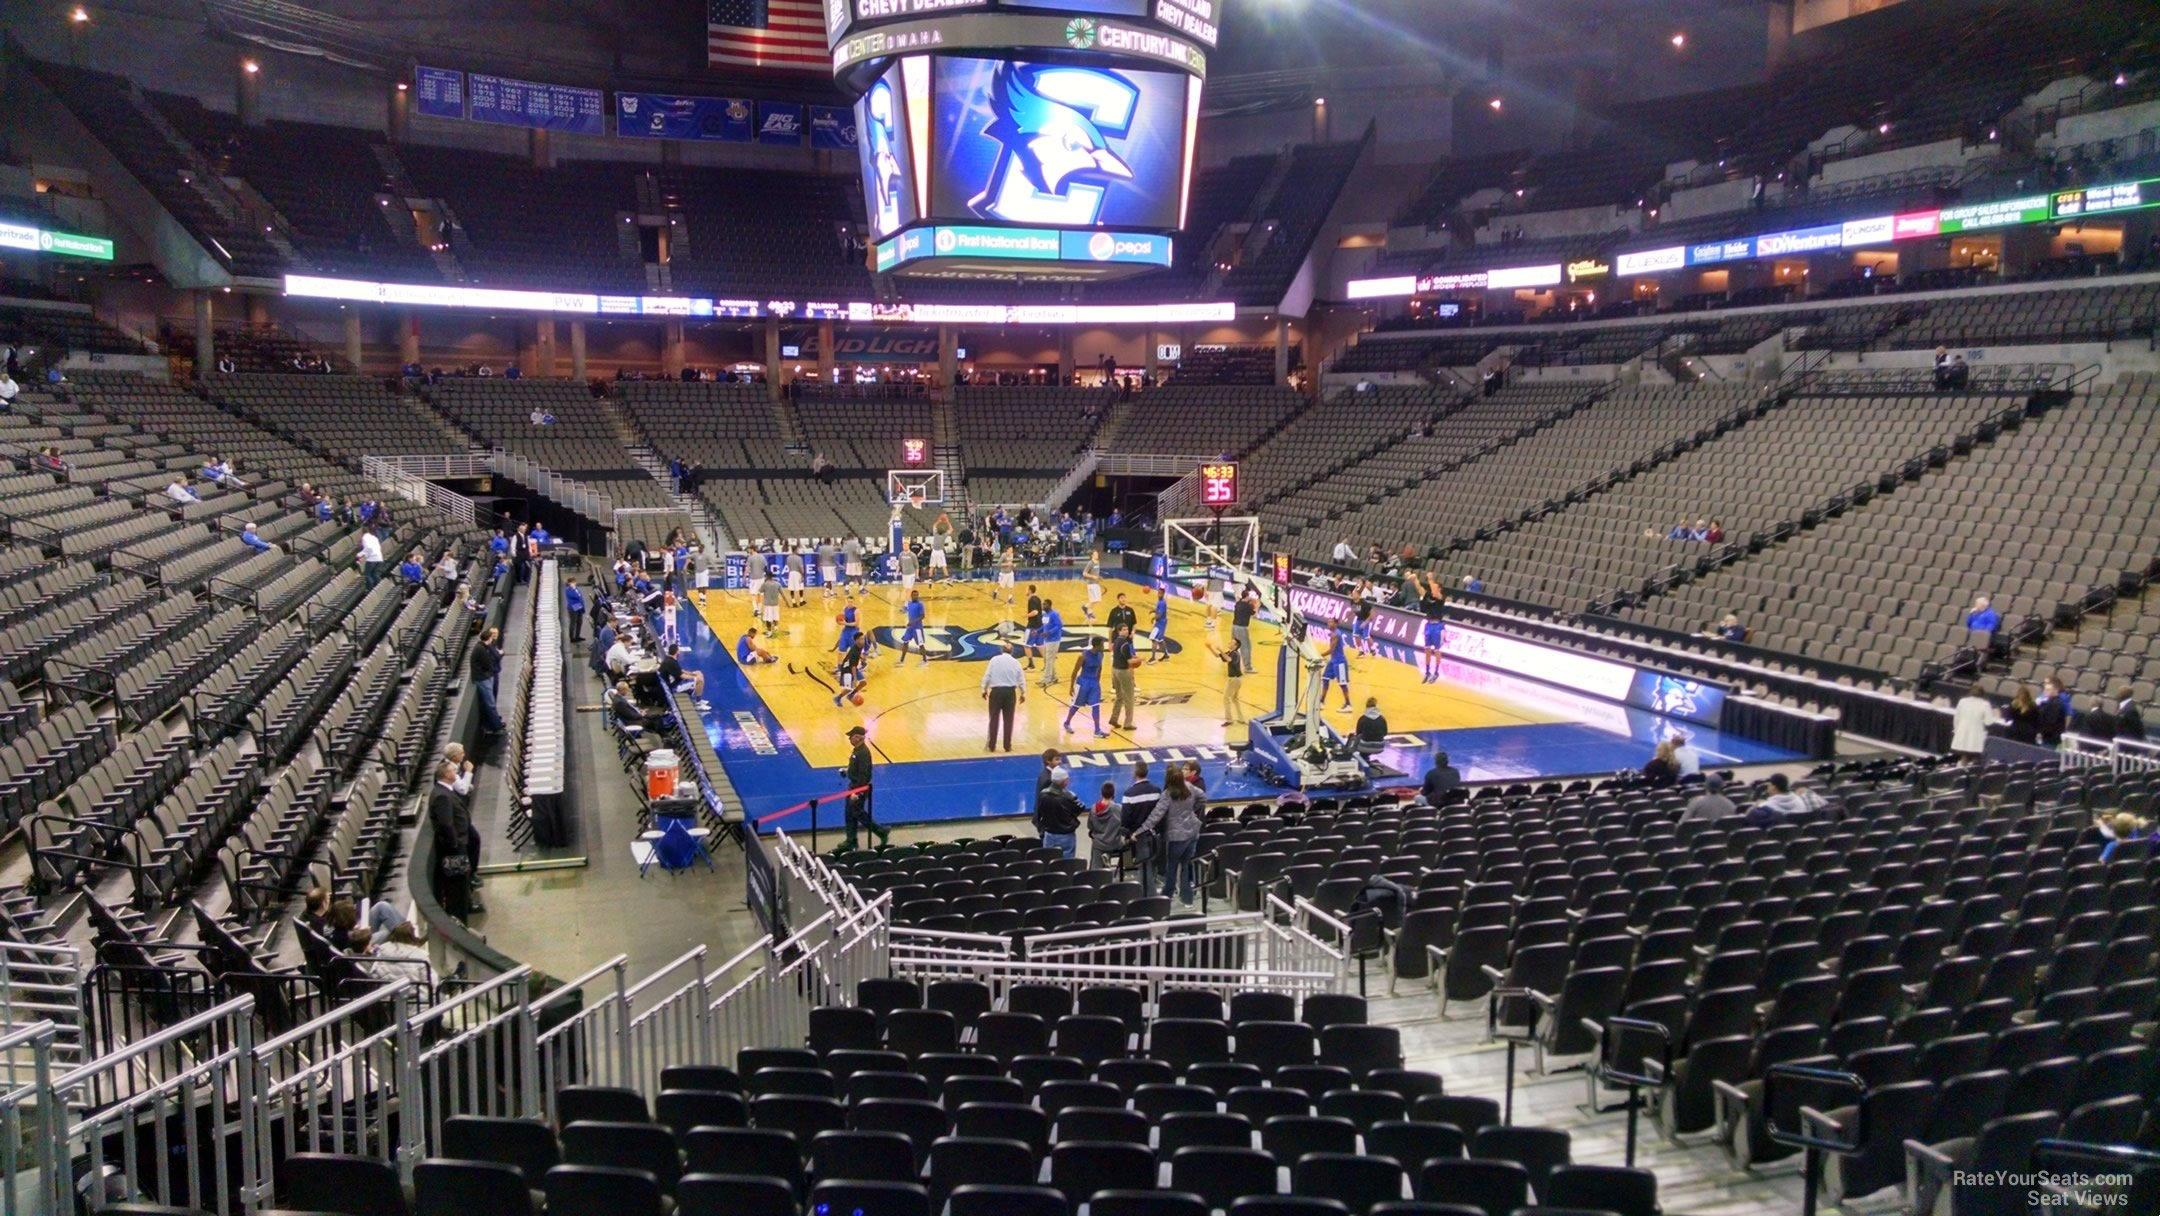 Centurylink Center Omaha >> Chi Health Center Omaha Section 114 Creighton Basketball